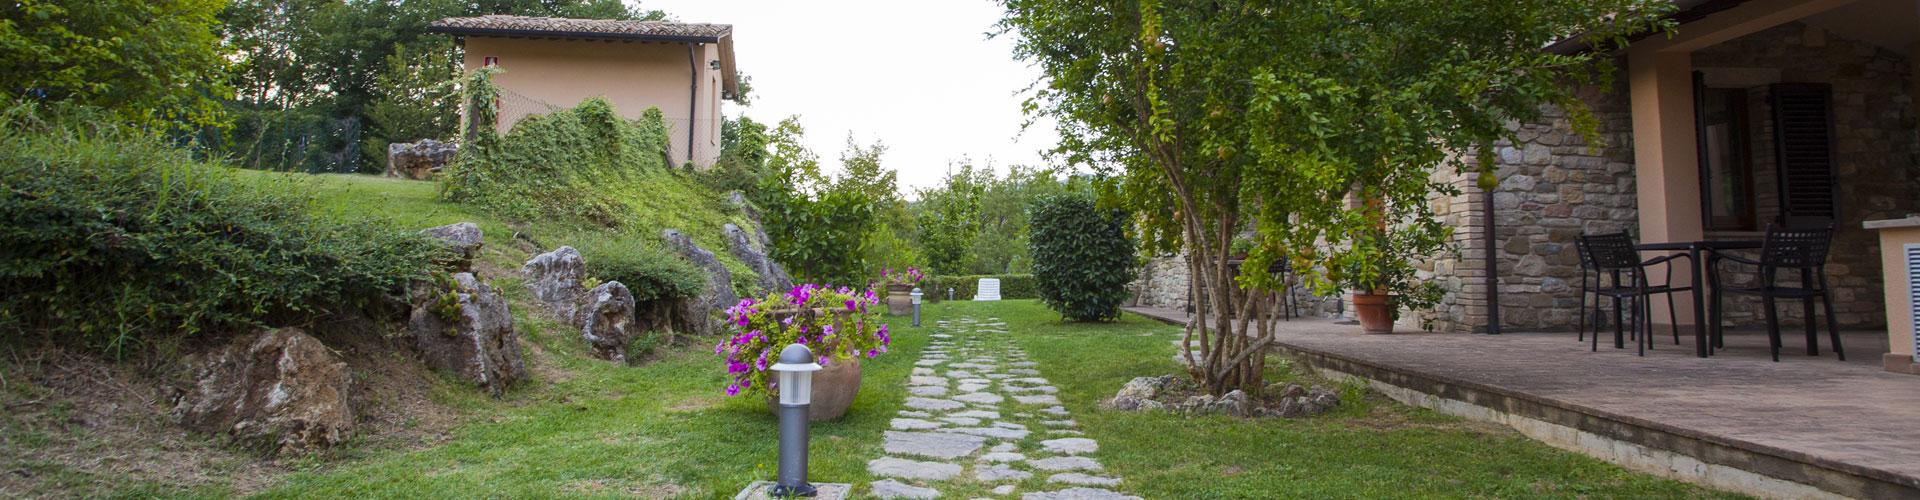 Agriturismo Assisi Relais Parco del Subasio - Residenze